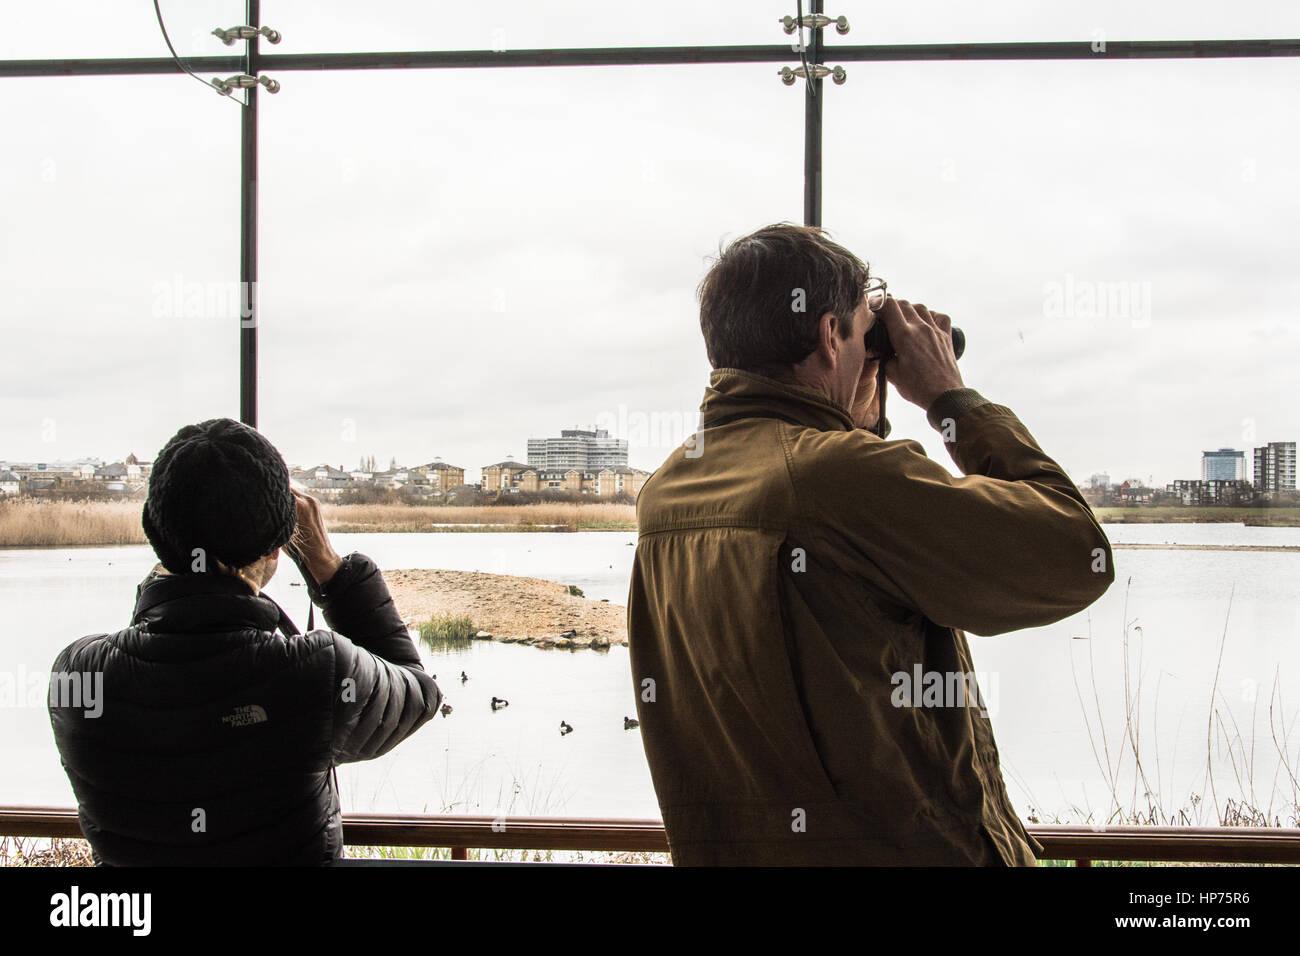 Keen eyed Twitchers (bird watchers) - Stock Image